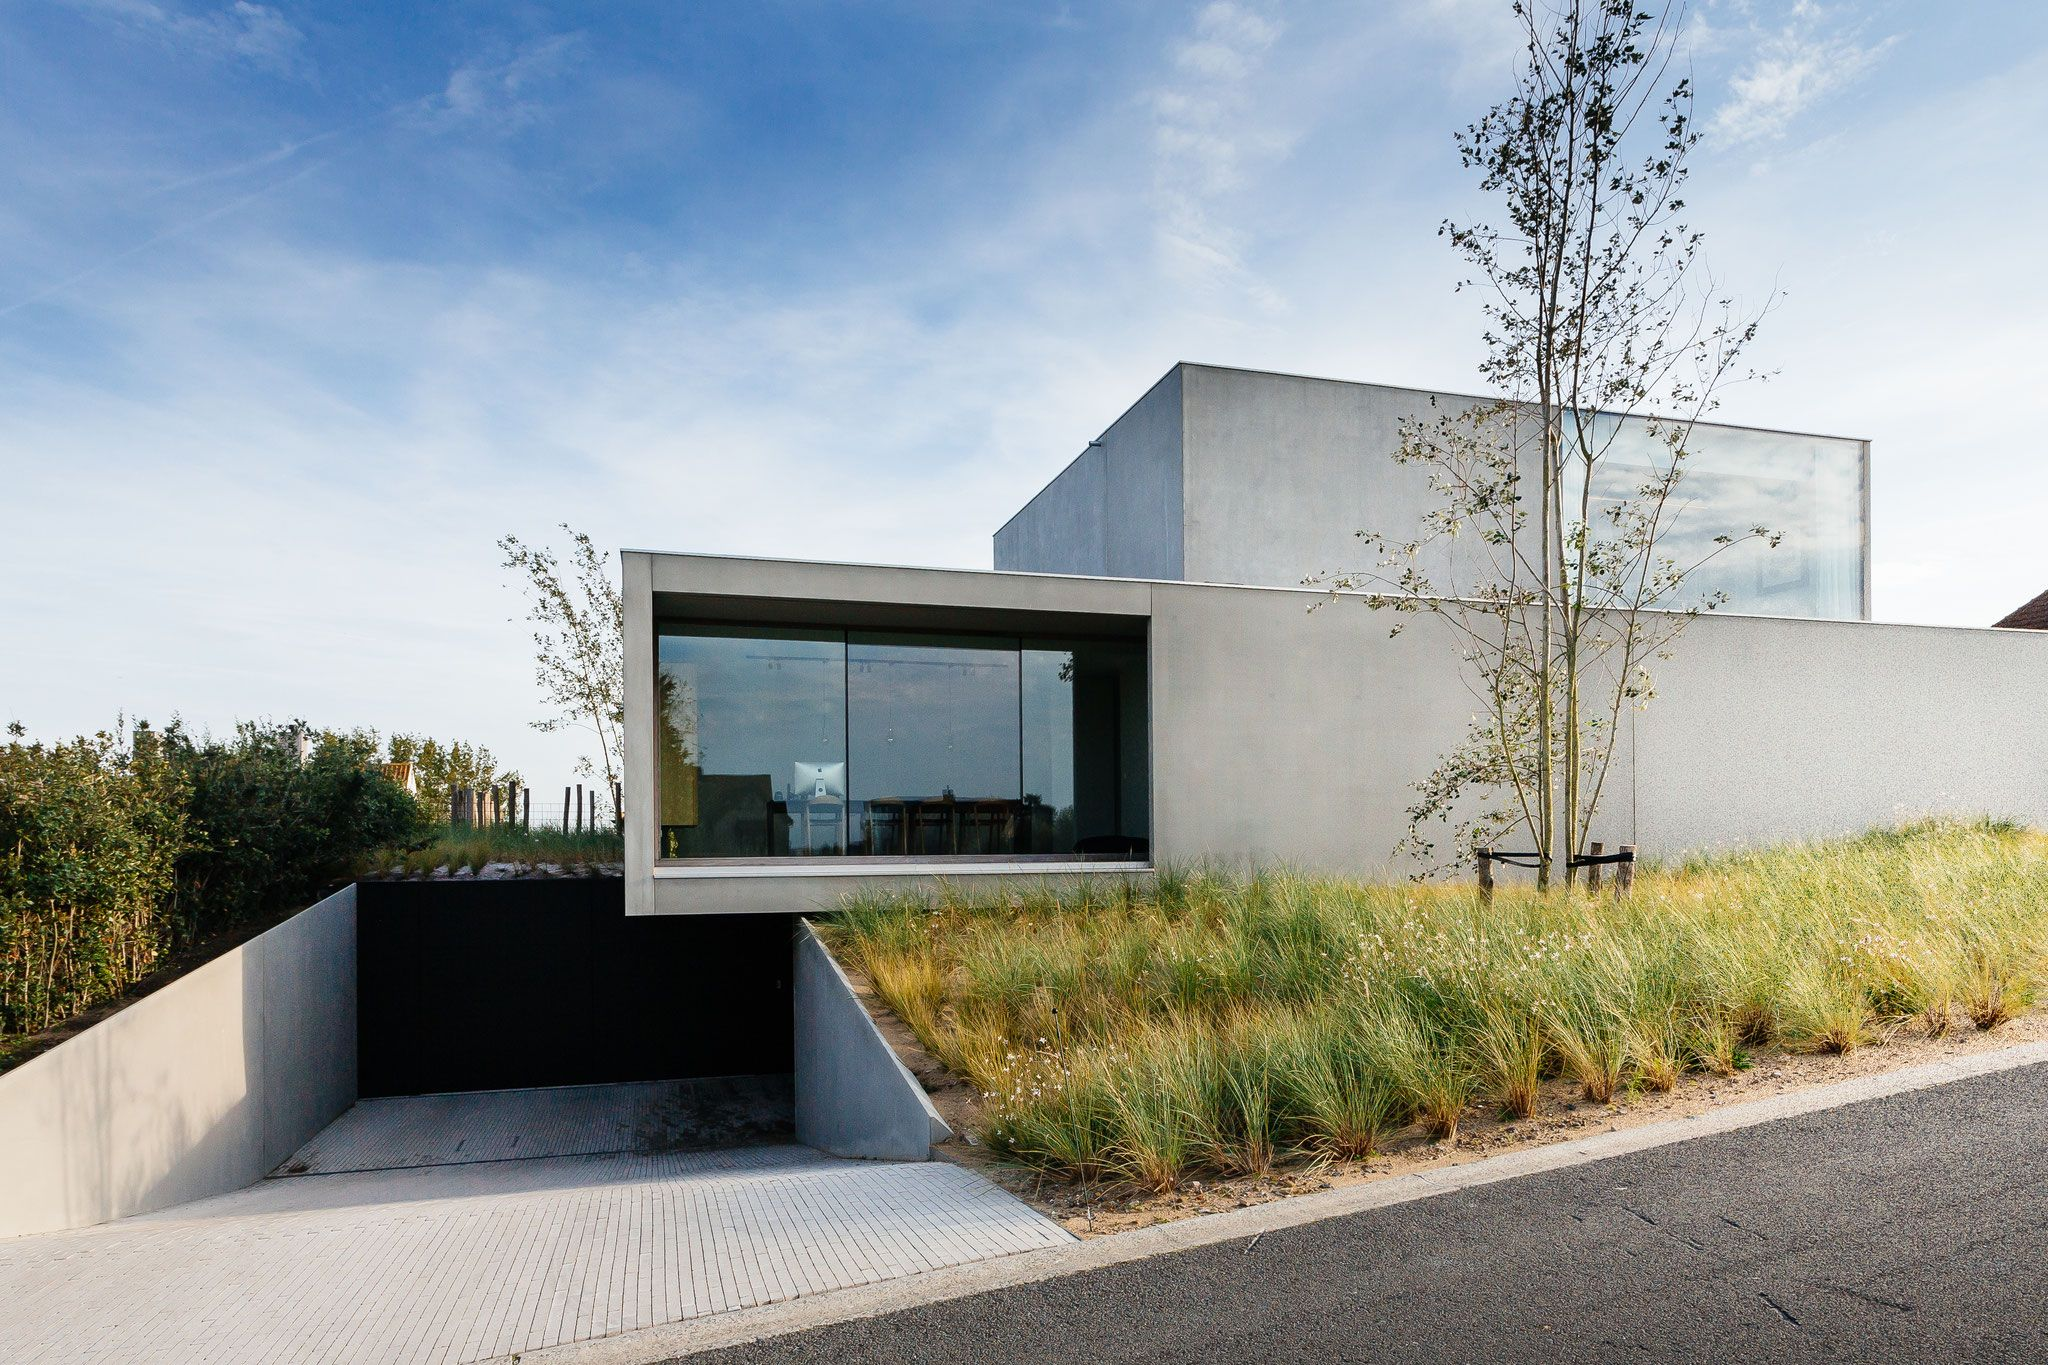 Snel huizen bouw modulair bouwen prefab beton huizen huizen in prefab beton prefab for Prefab maison